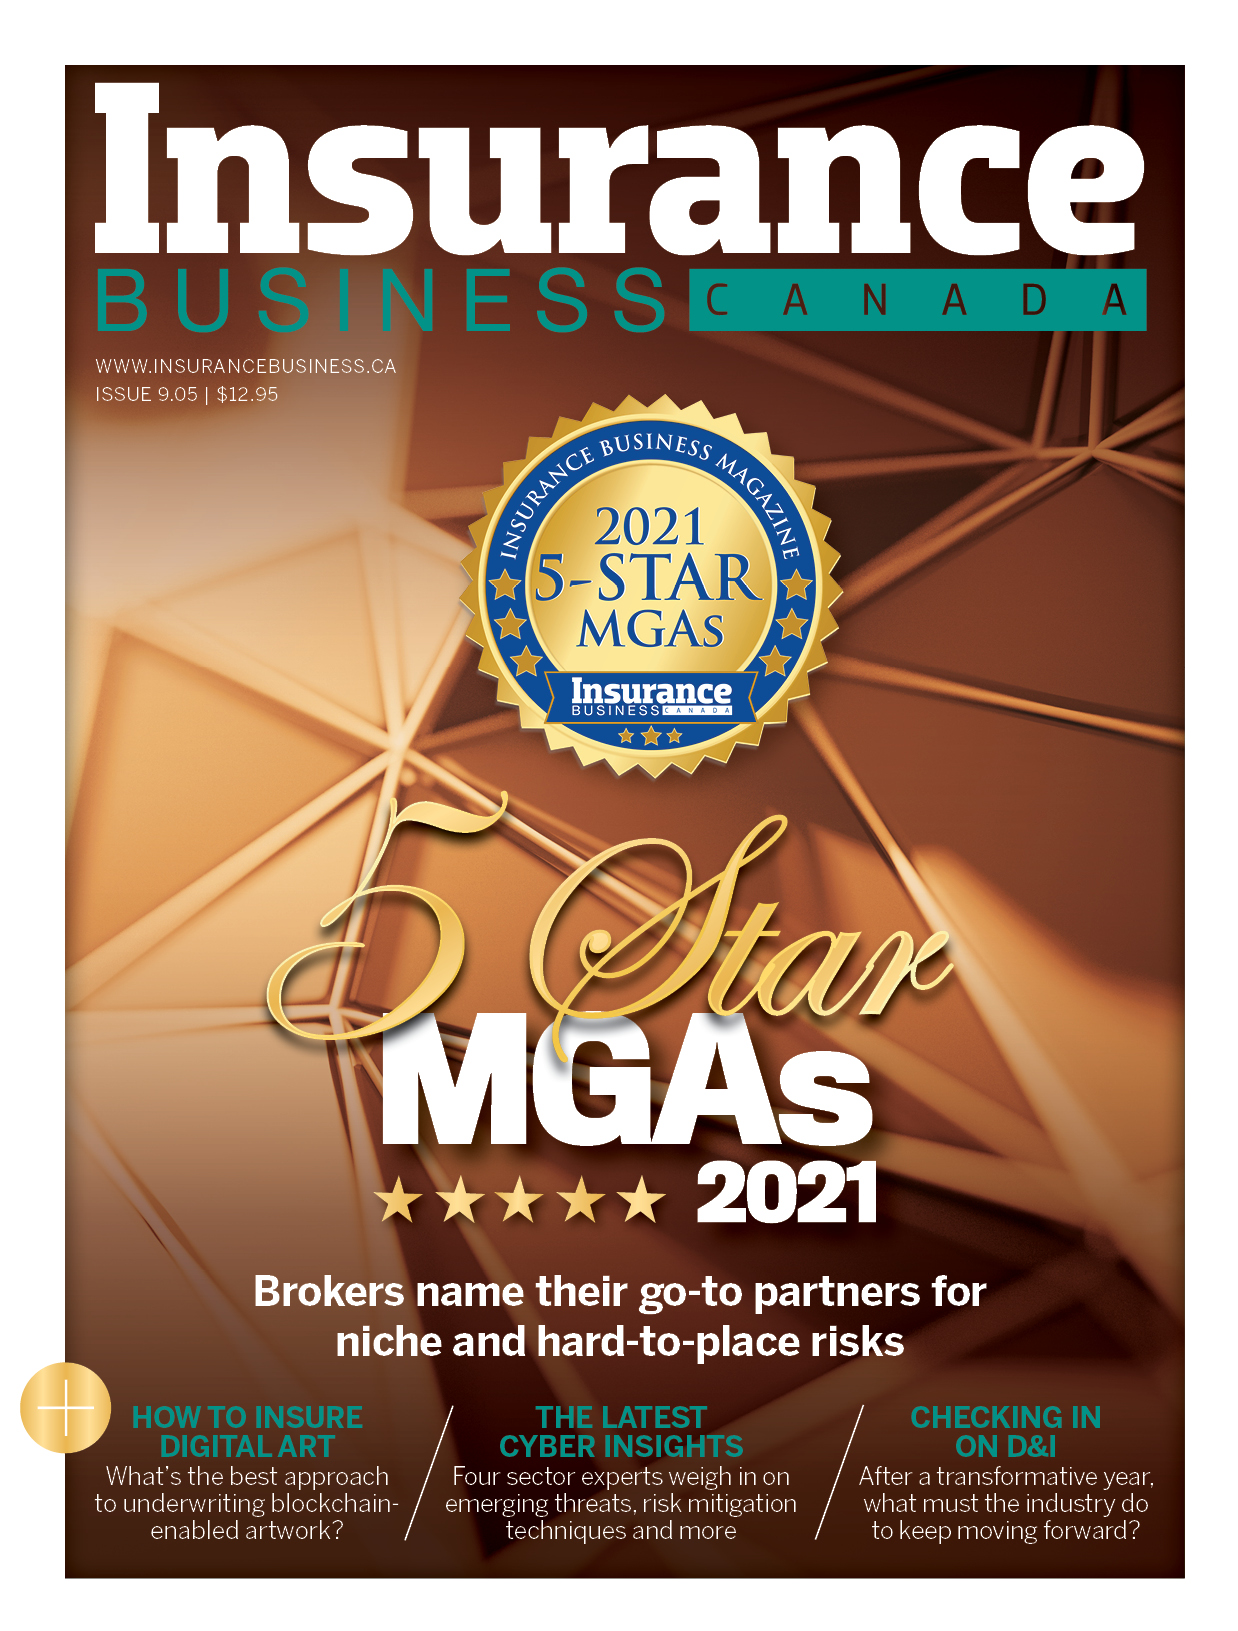 Insurance Business Magazine 9.05